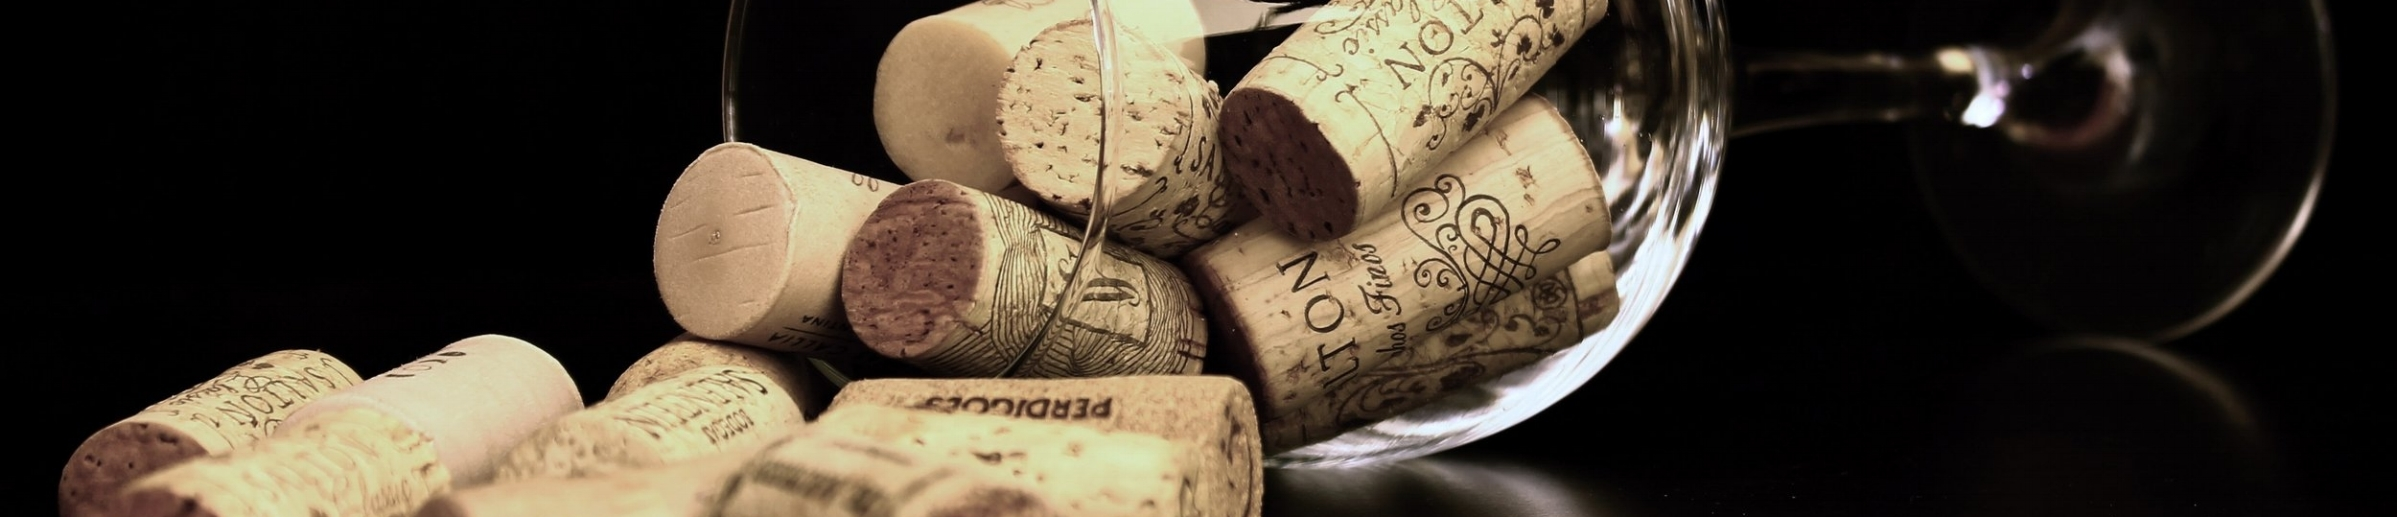 corks-wine-glass-36741.jpg